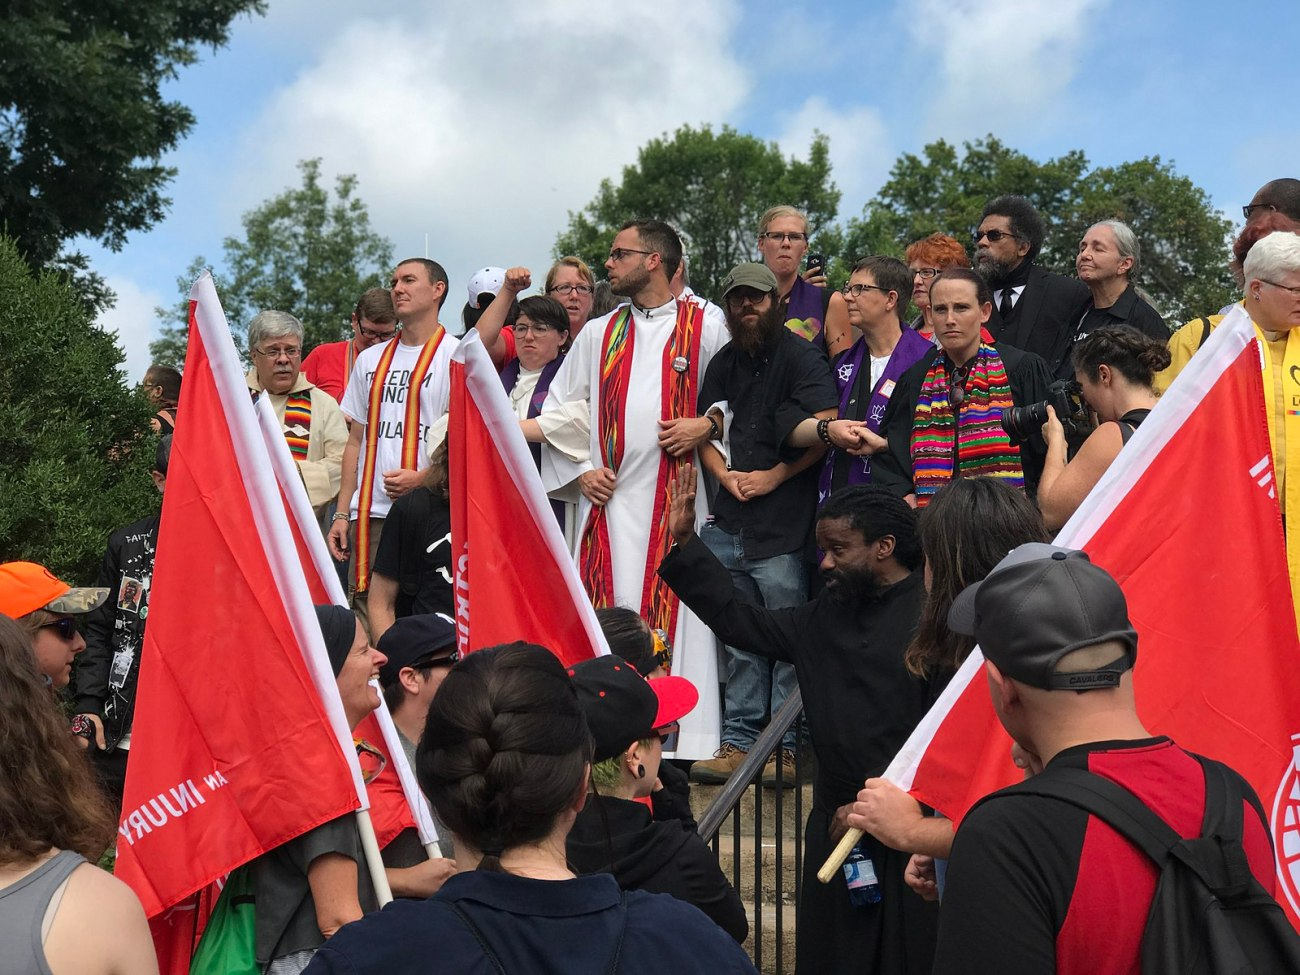 1600px-Charlottesville__Unite_the_Right__Rally_(35780272084)